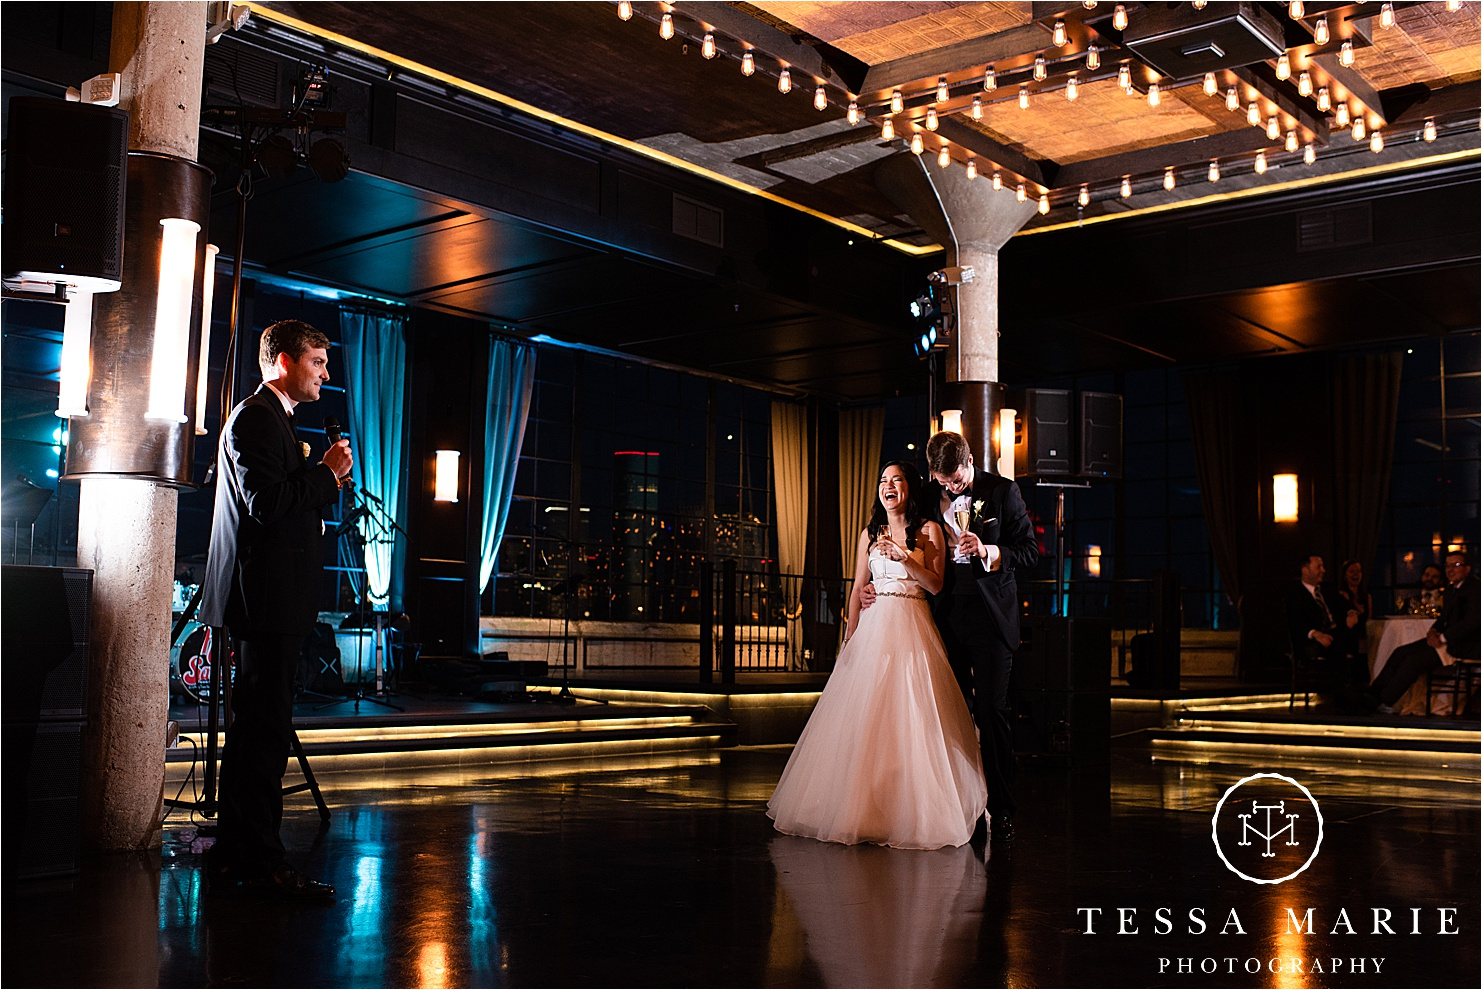 Tessa_marie_weddings_houston_wedding_photographer_The_astorian_0157.jpg